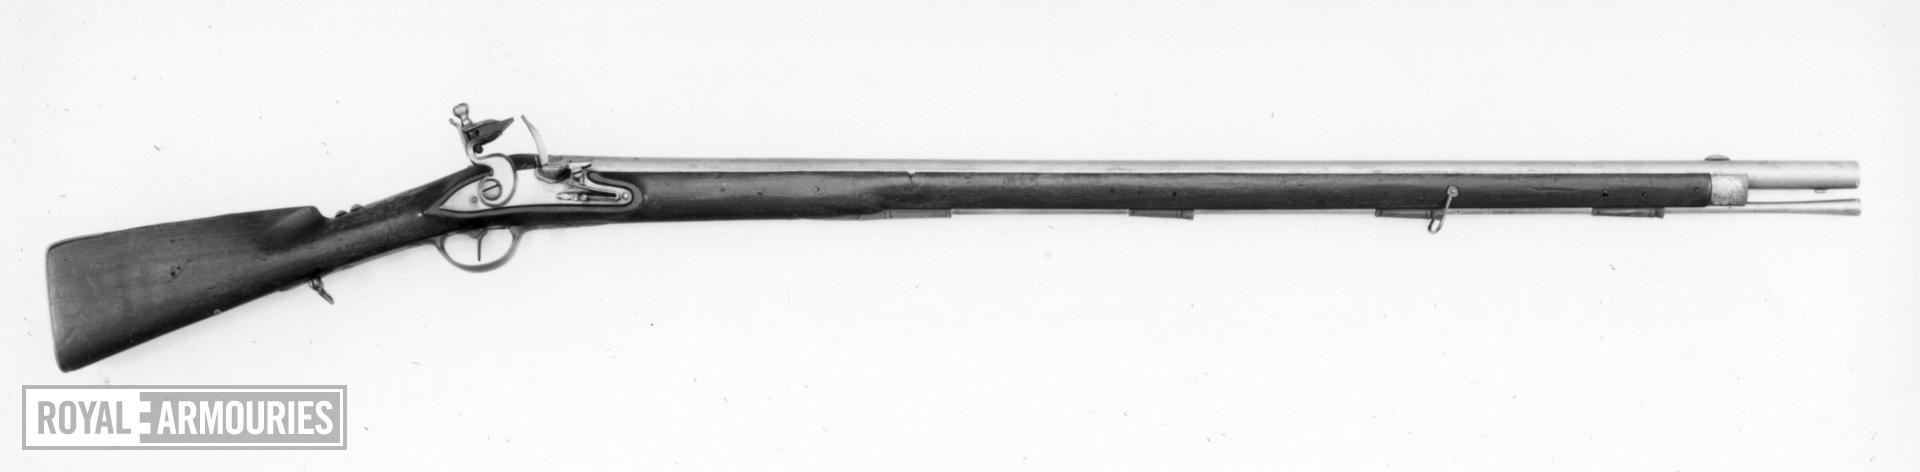 Flintlock muzzle-loading military musket - Hessian model, sealed pattern